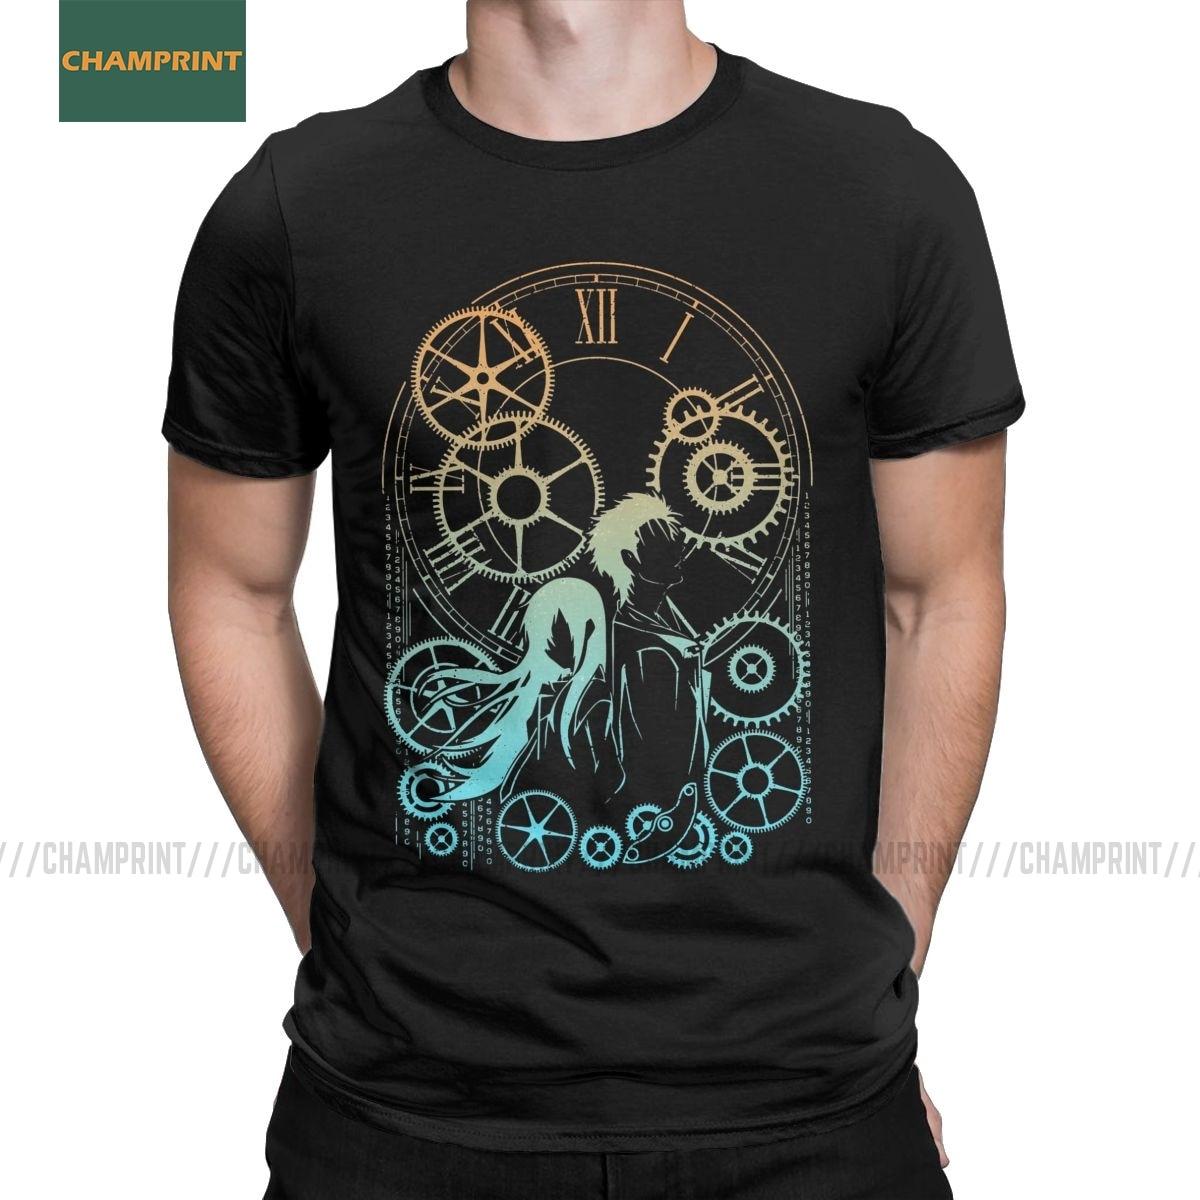 Time Steins Gate, футболки для мужчин, хлопковые футболки, аниме, майури, макисе, манга, дару, Шиина, Ринтаро, игровая футболка, короткий рукав